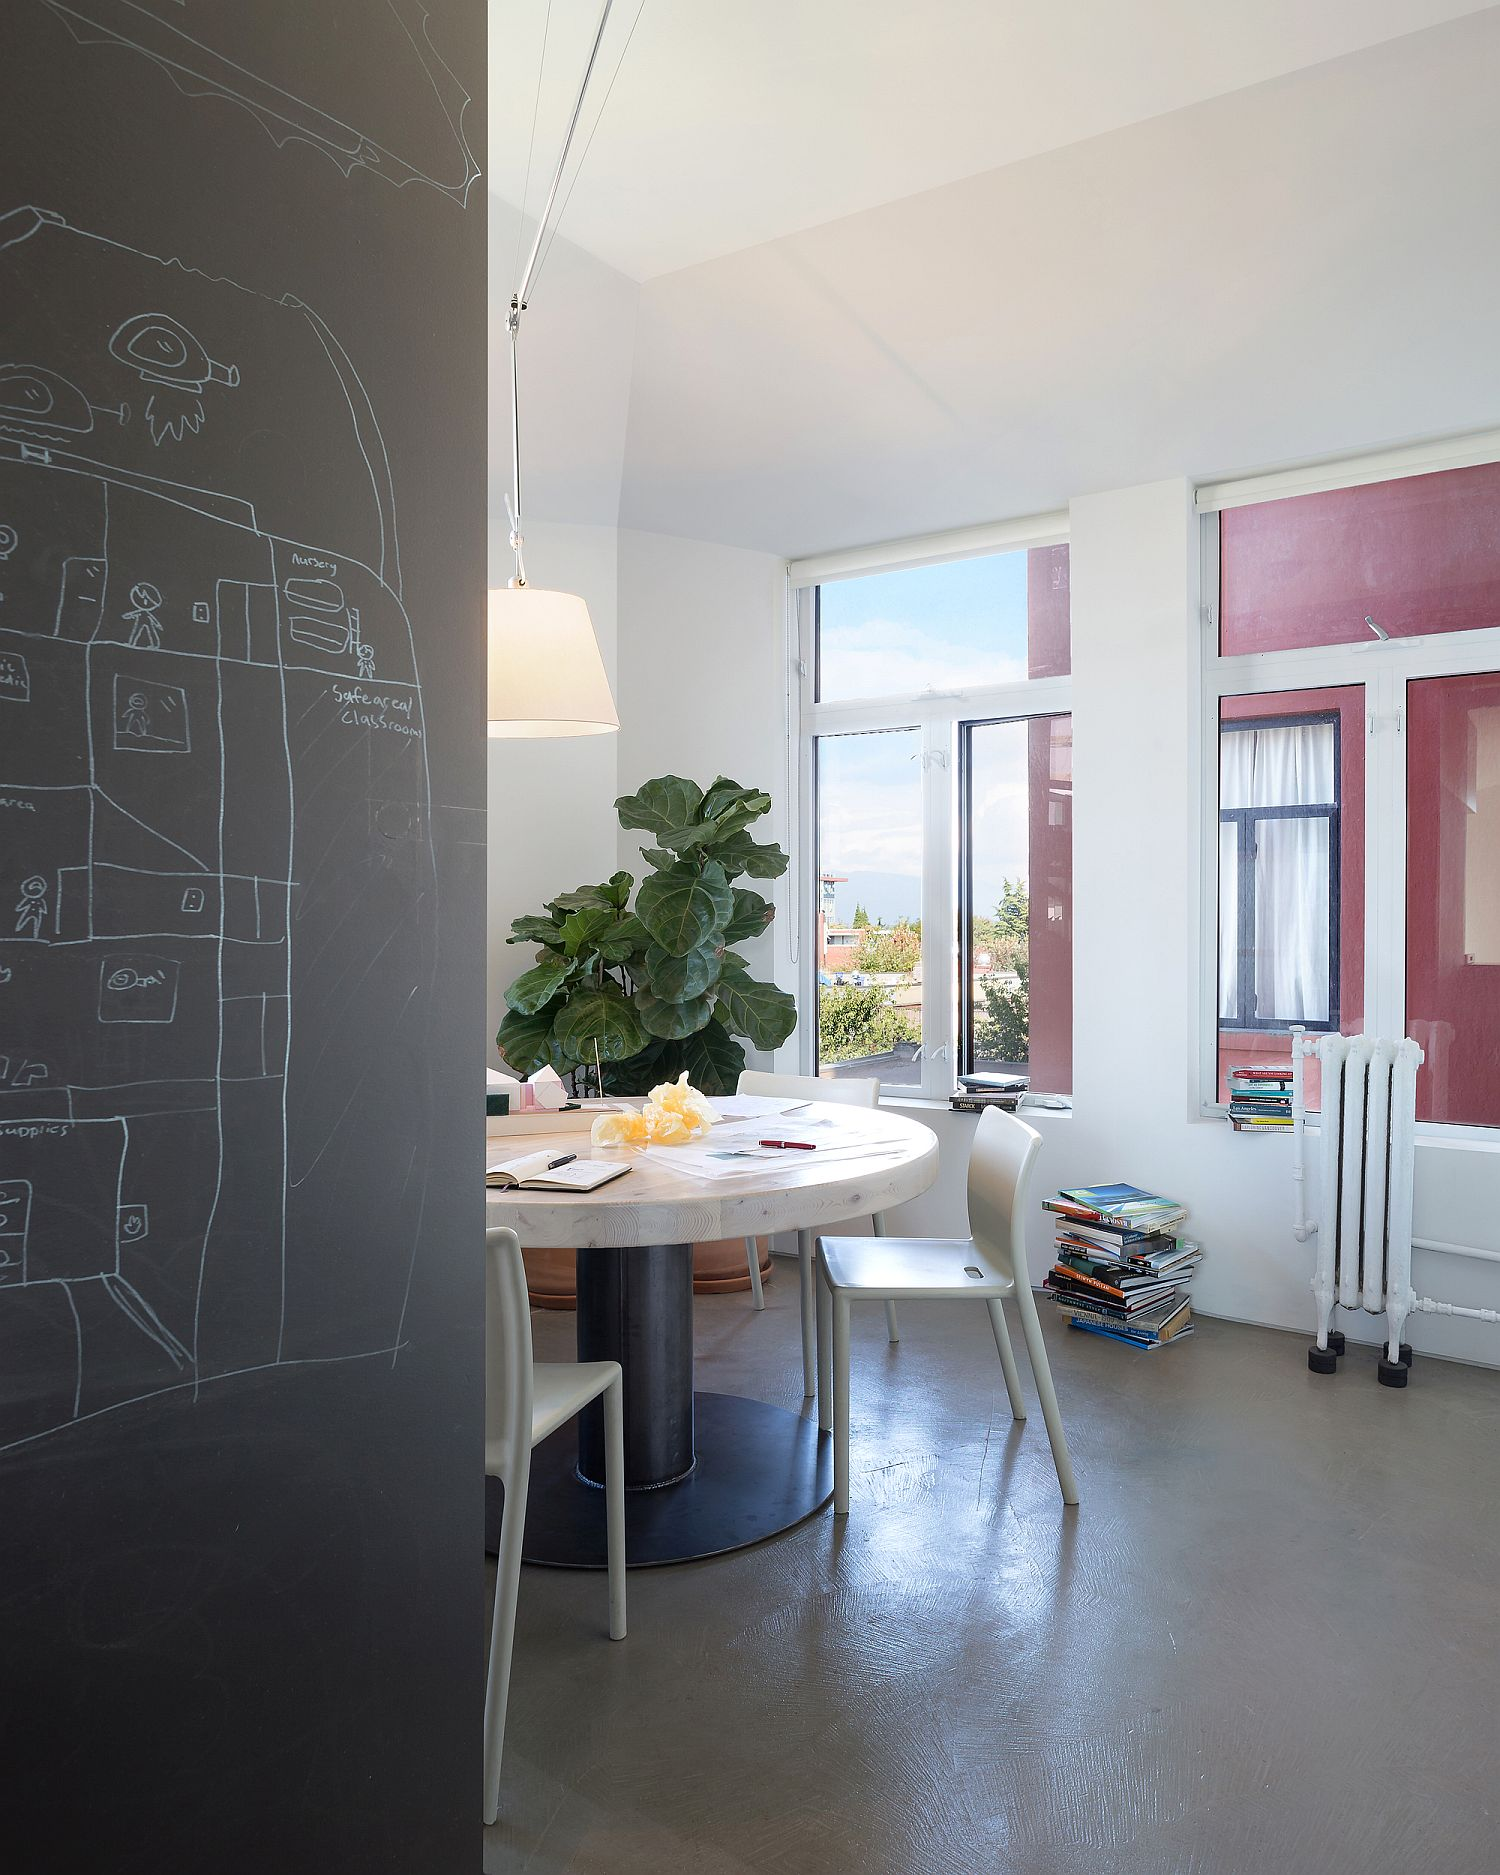 Creative-space-and-chalkboard-wall-inside-Studio-Three